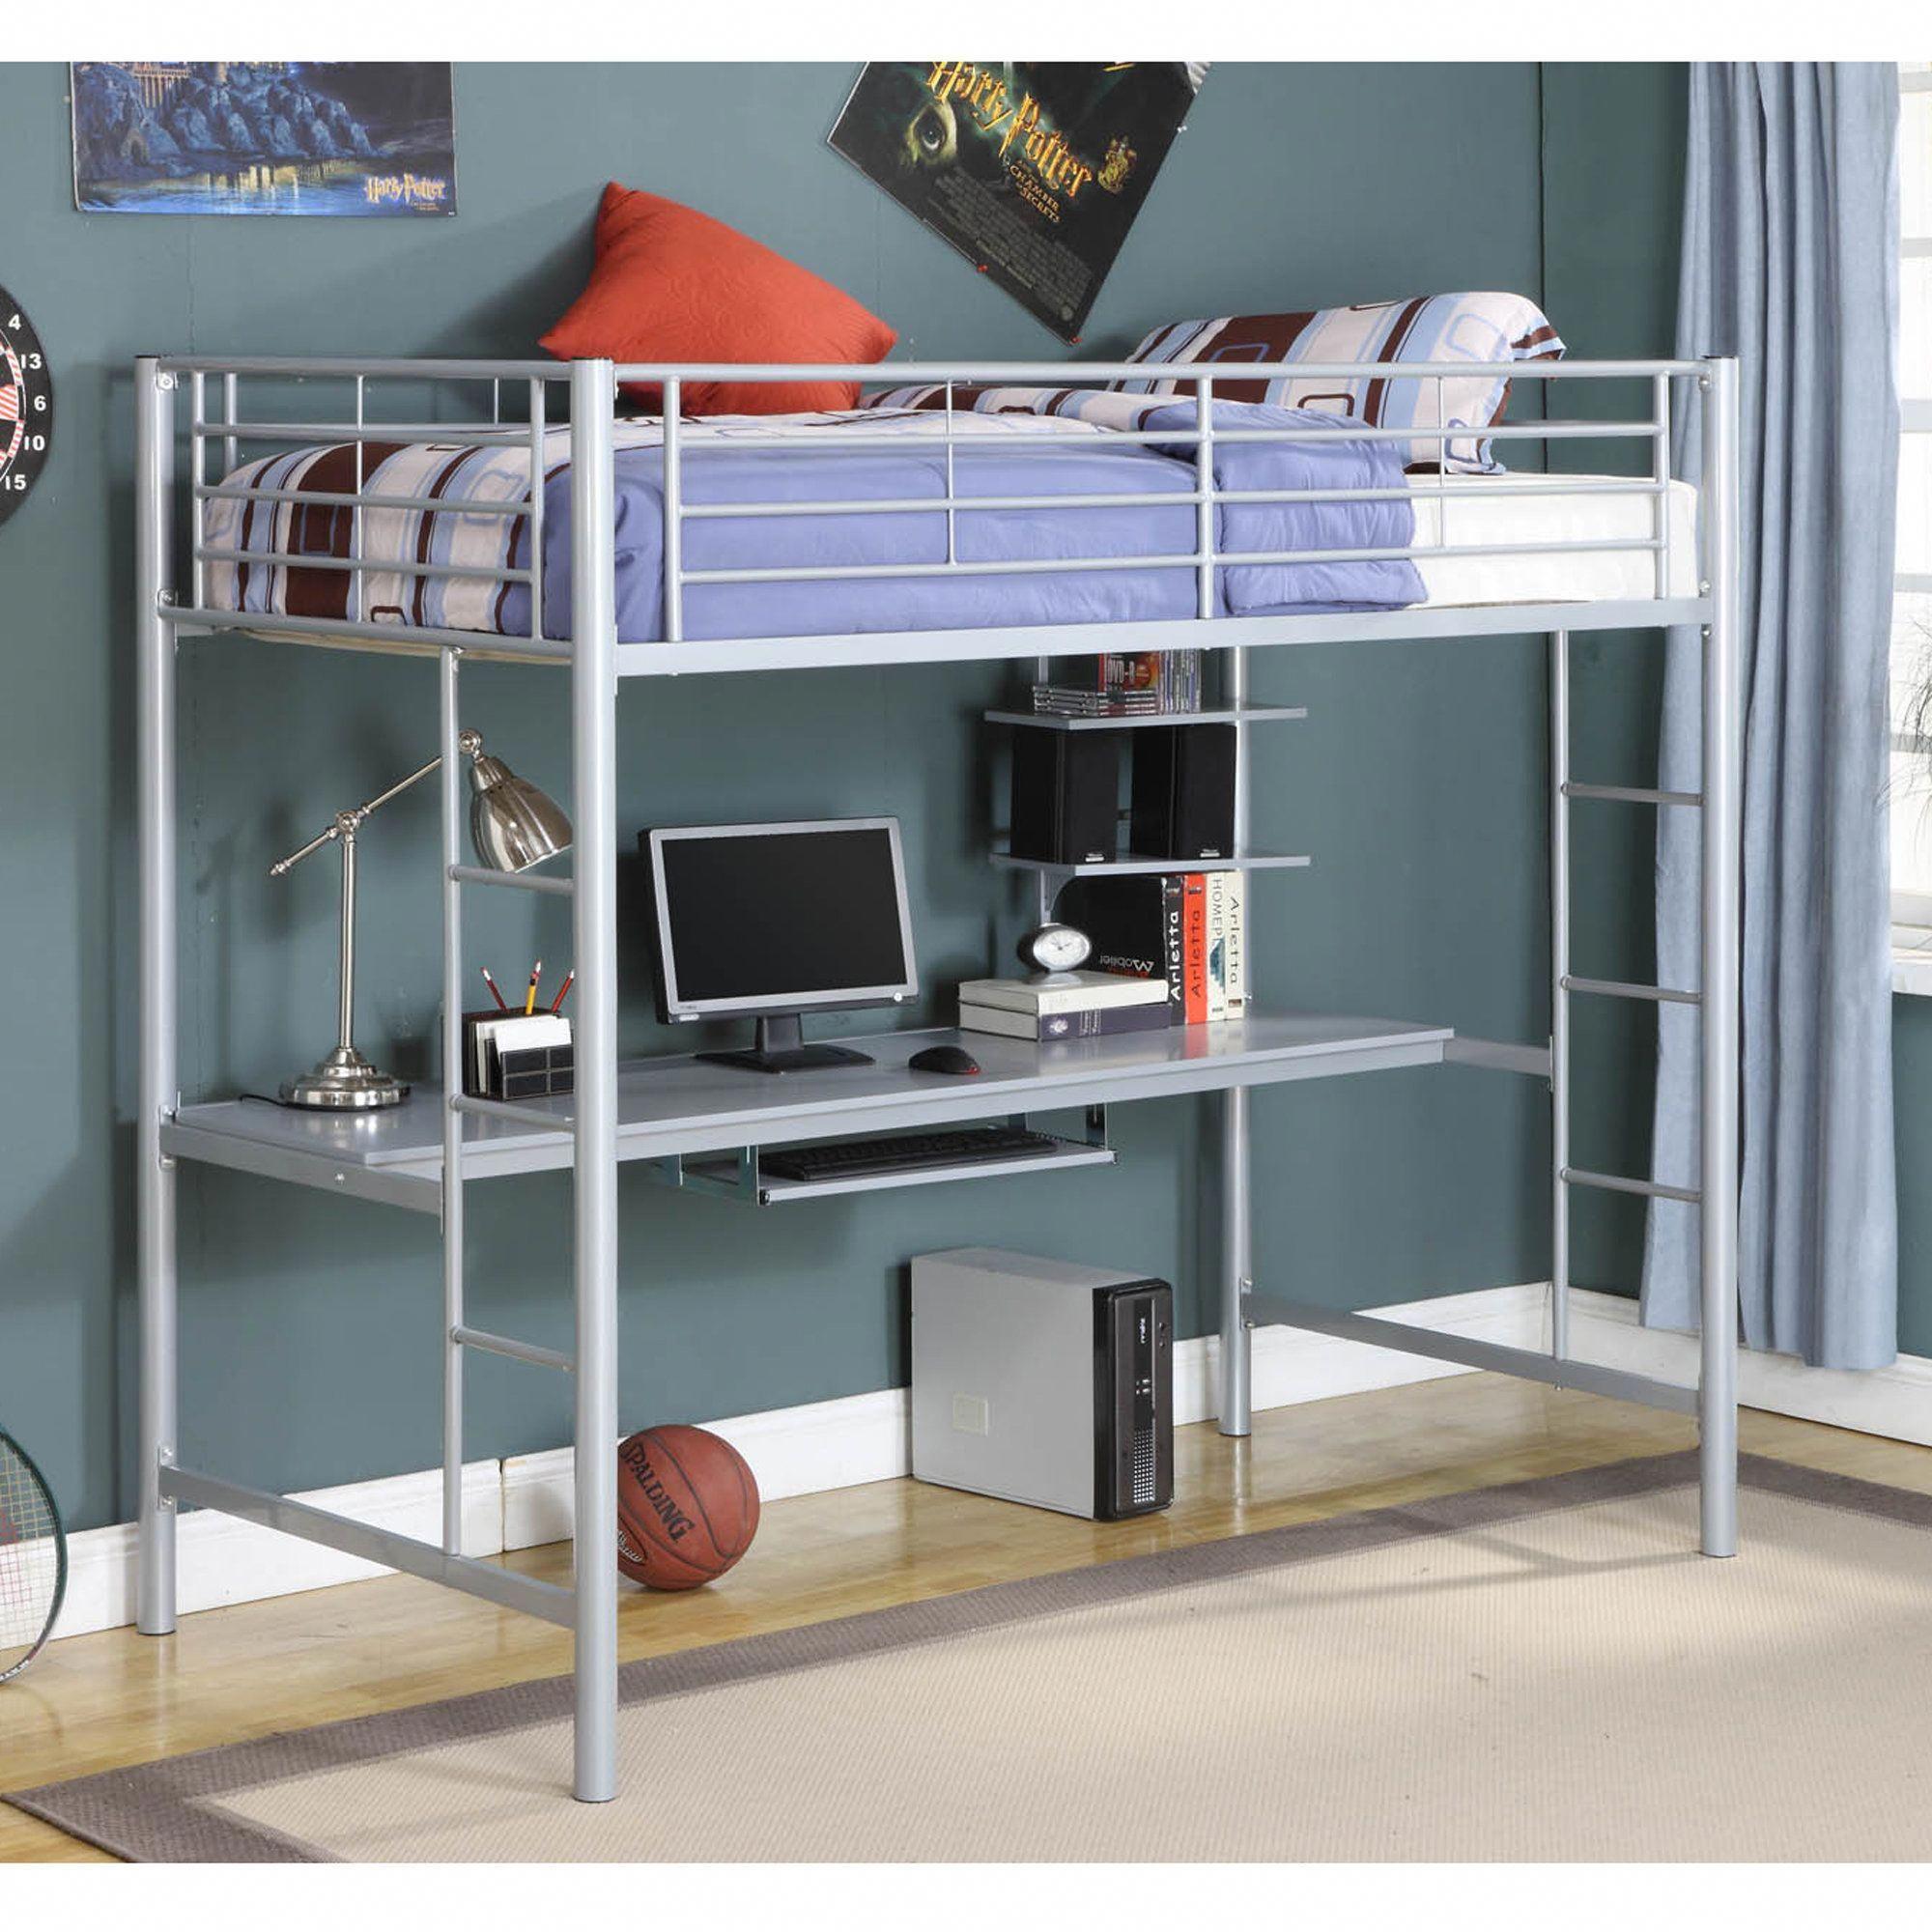 "2ec4827f64e1e Belfort Twin Loft Bed with Wood Workstation  ""bunkbedswithdesksunderneath"""